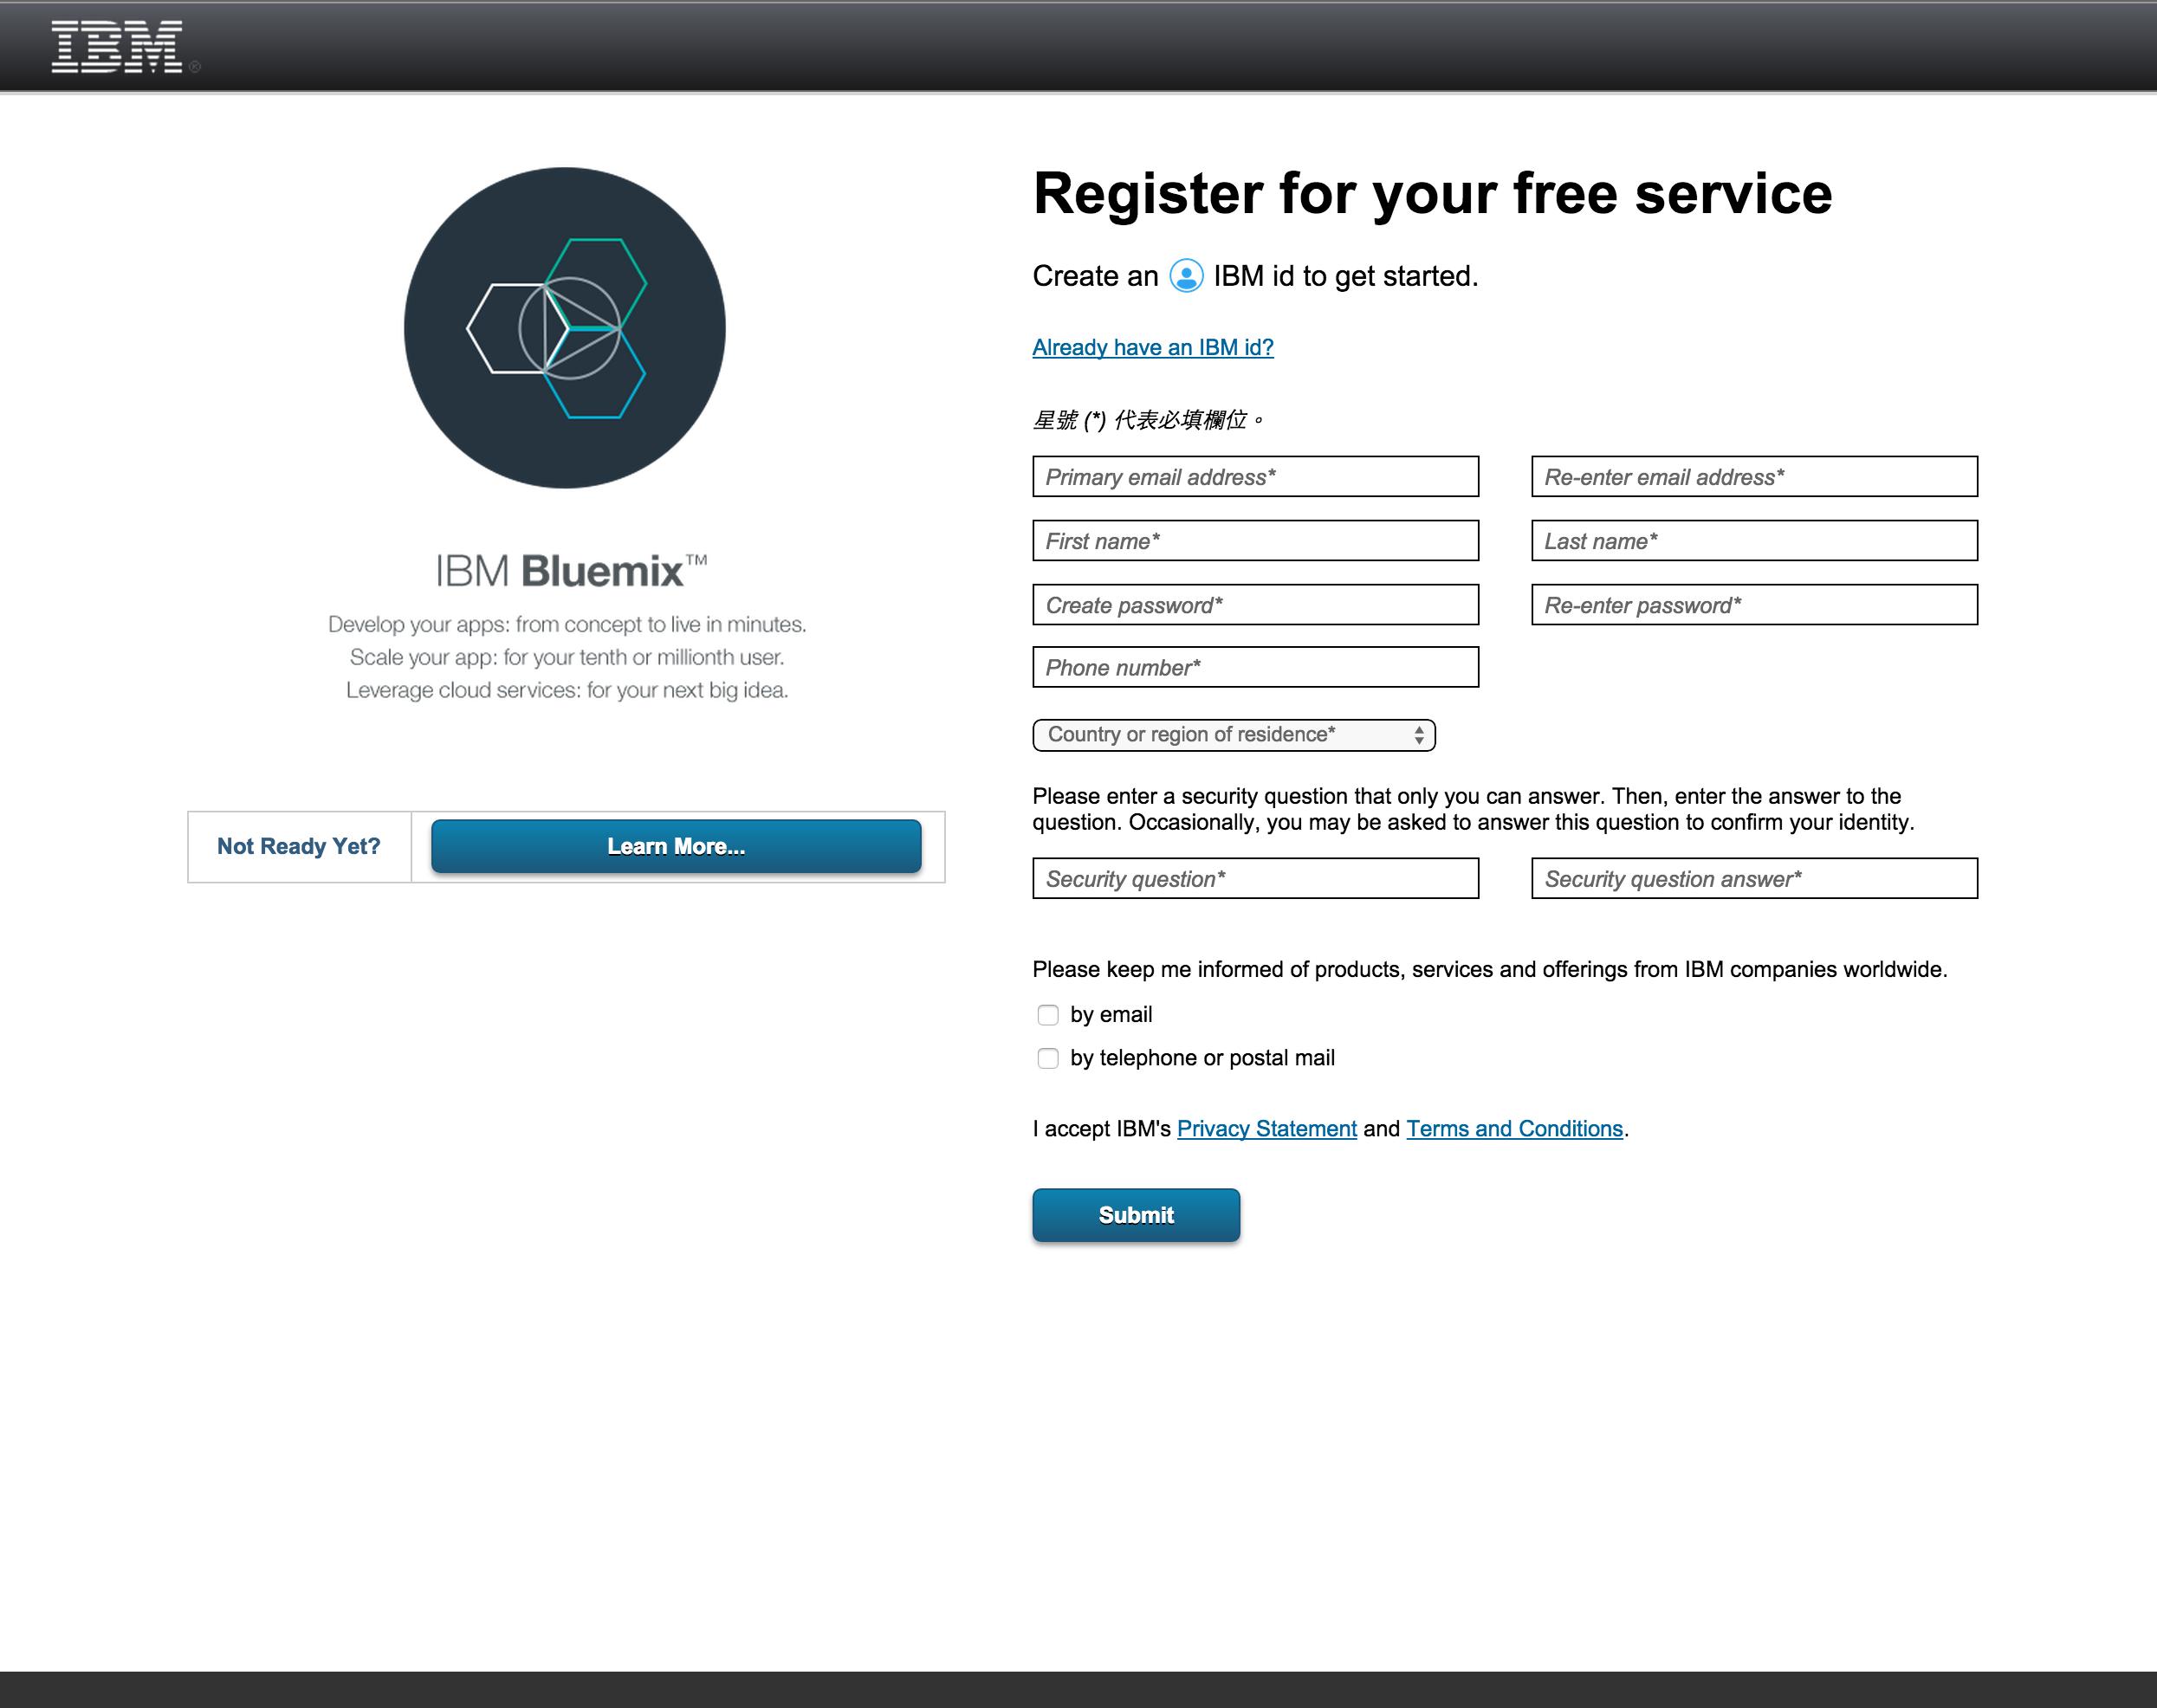 IBM Bluemix 試用註冊